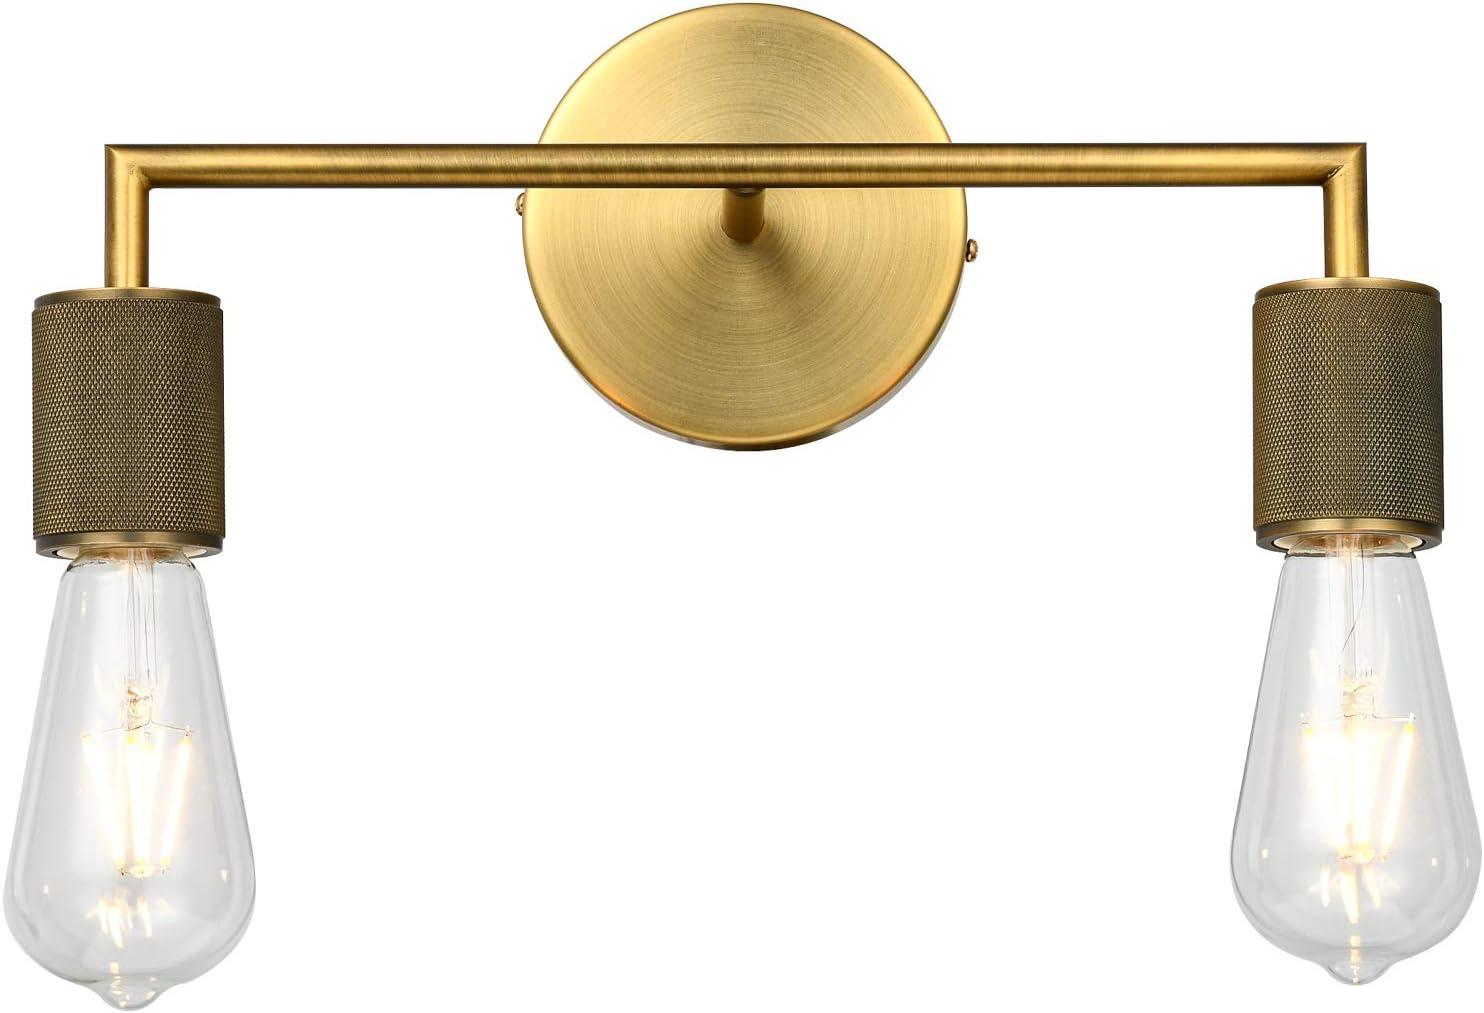 PASSICA DECOR 2 Light Antique Brass Sconce Vintage Wall Light Industrial Vanity Light Lamp Bathroom